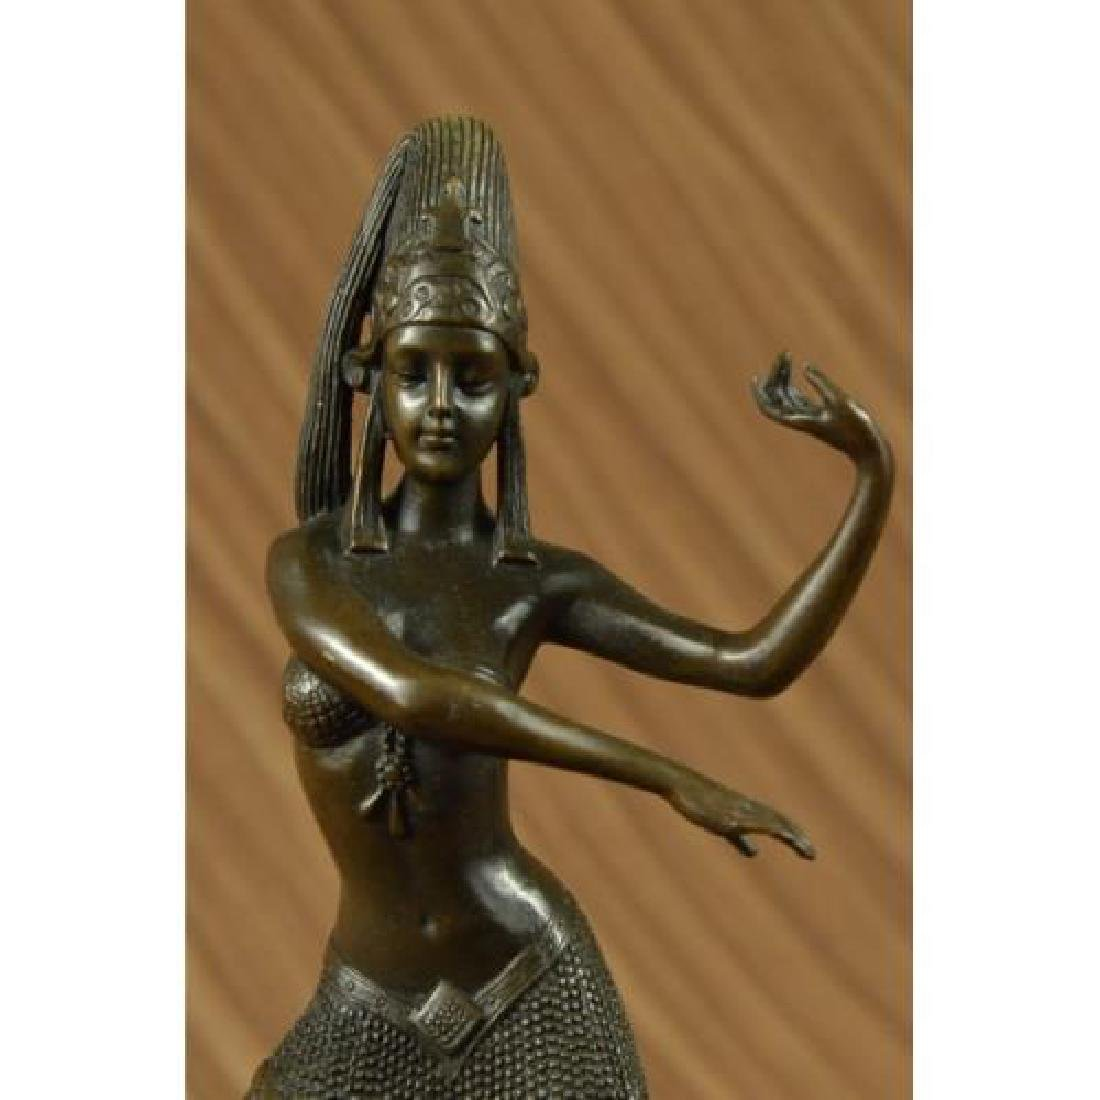 Egyptian Dancer Bronze Sculpture on Marble Base Statue - 5